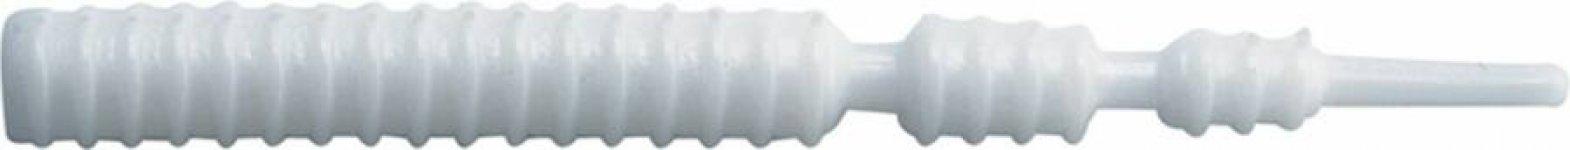 RAPTURE MEBARU IWASHI 45mm GW 12 db, plasztik csali